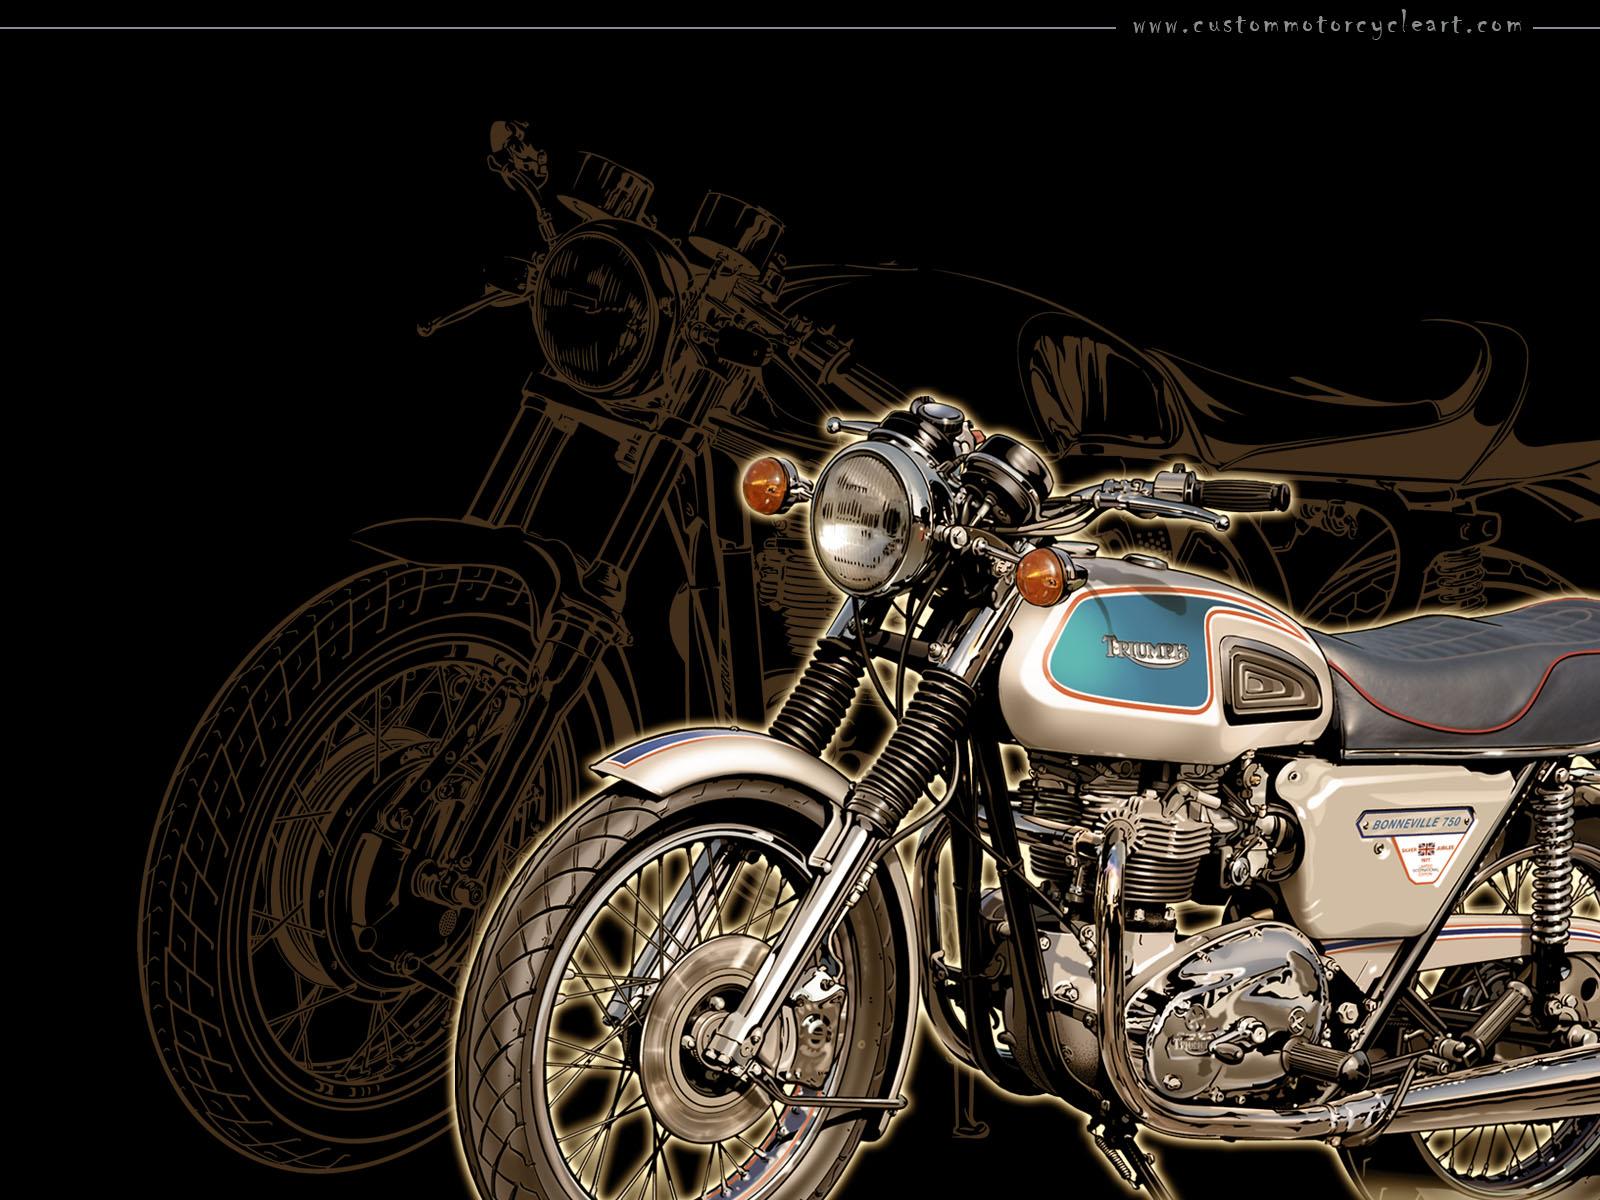 hayabusa tuning motorbikes 2560 - photo #26